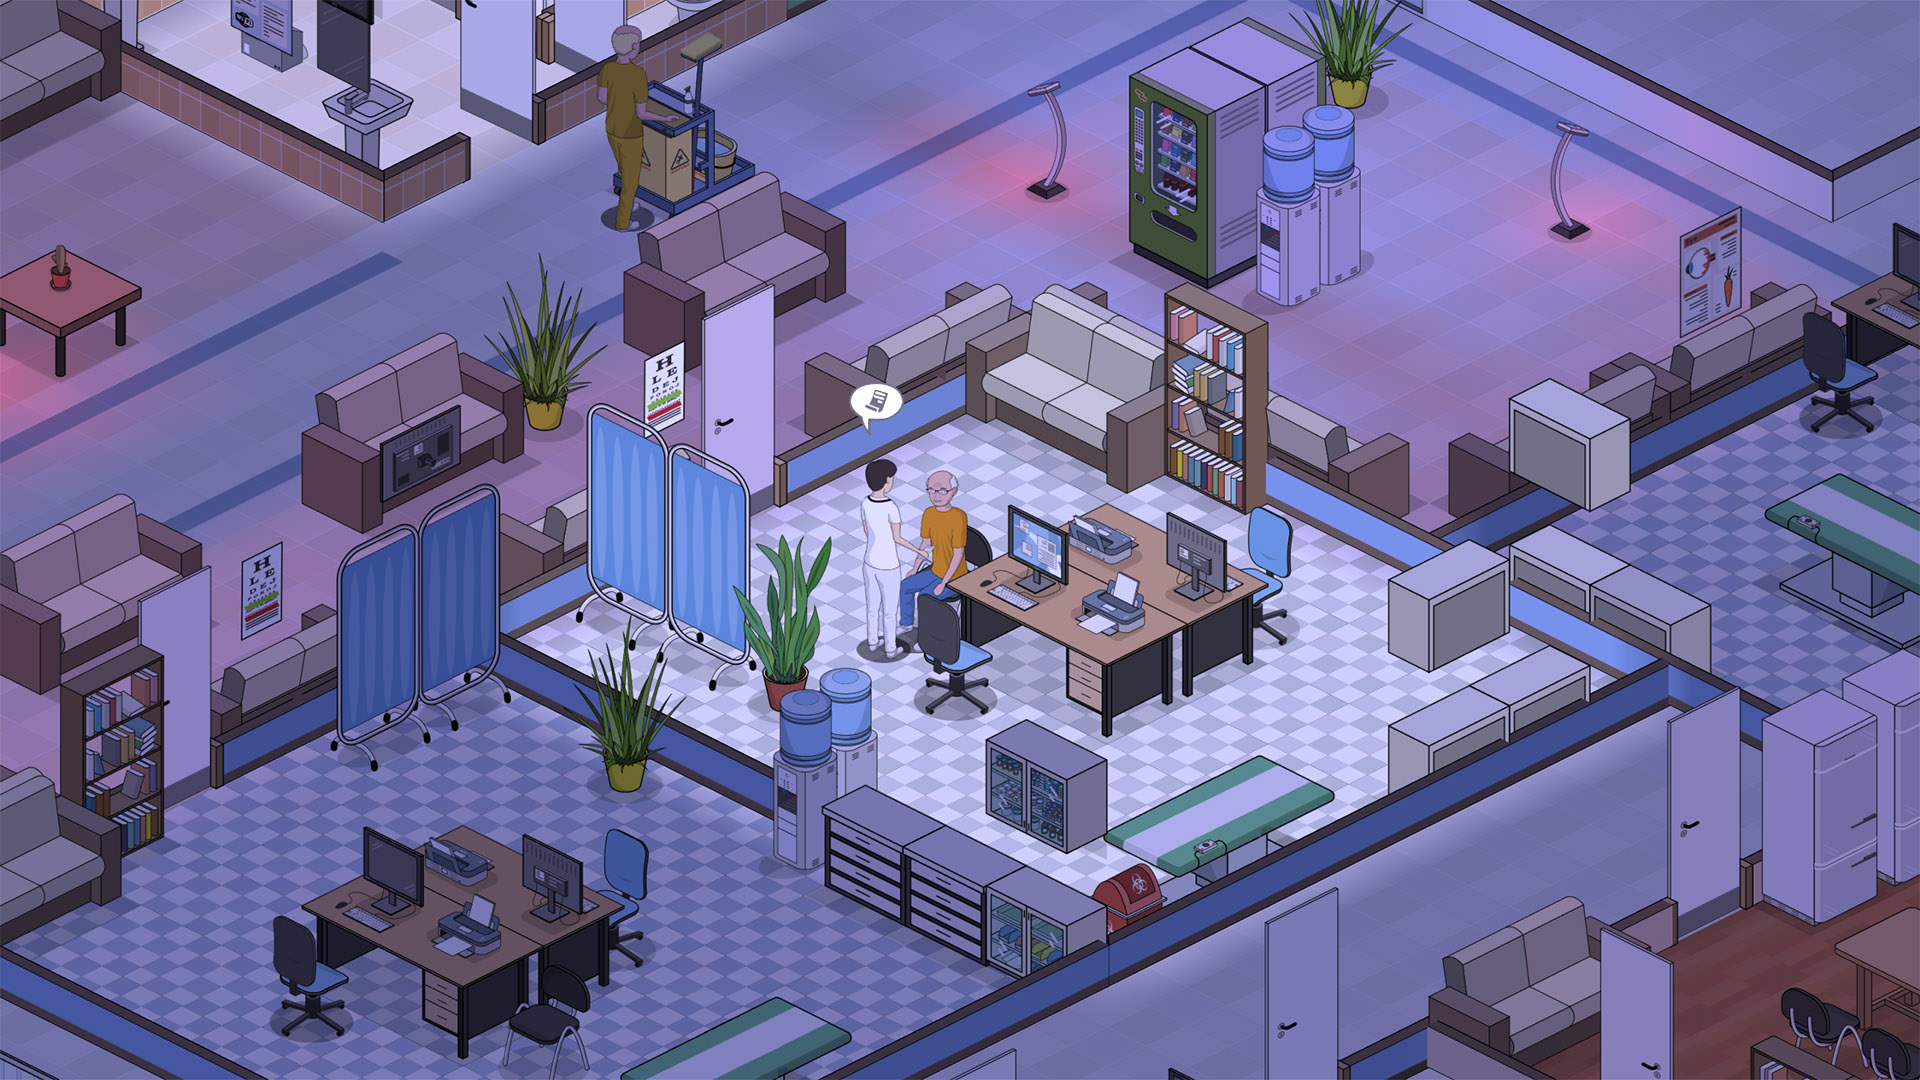 project hospital screenshot 04